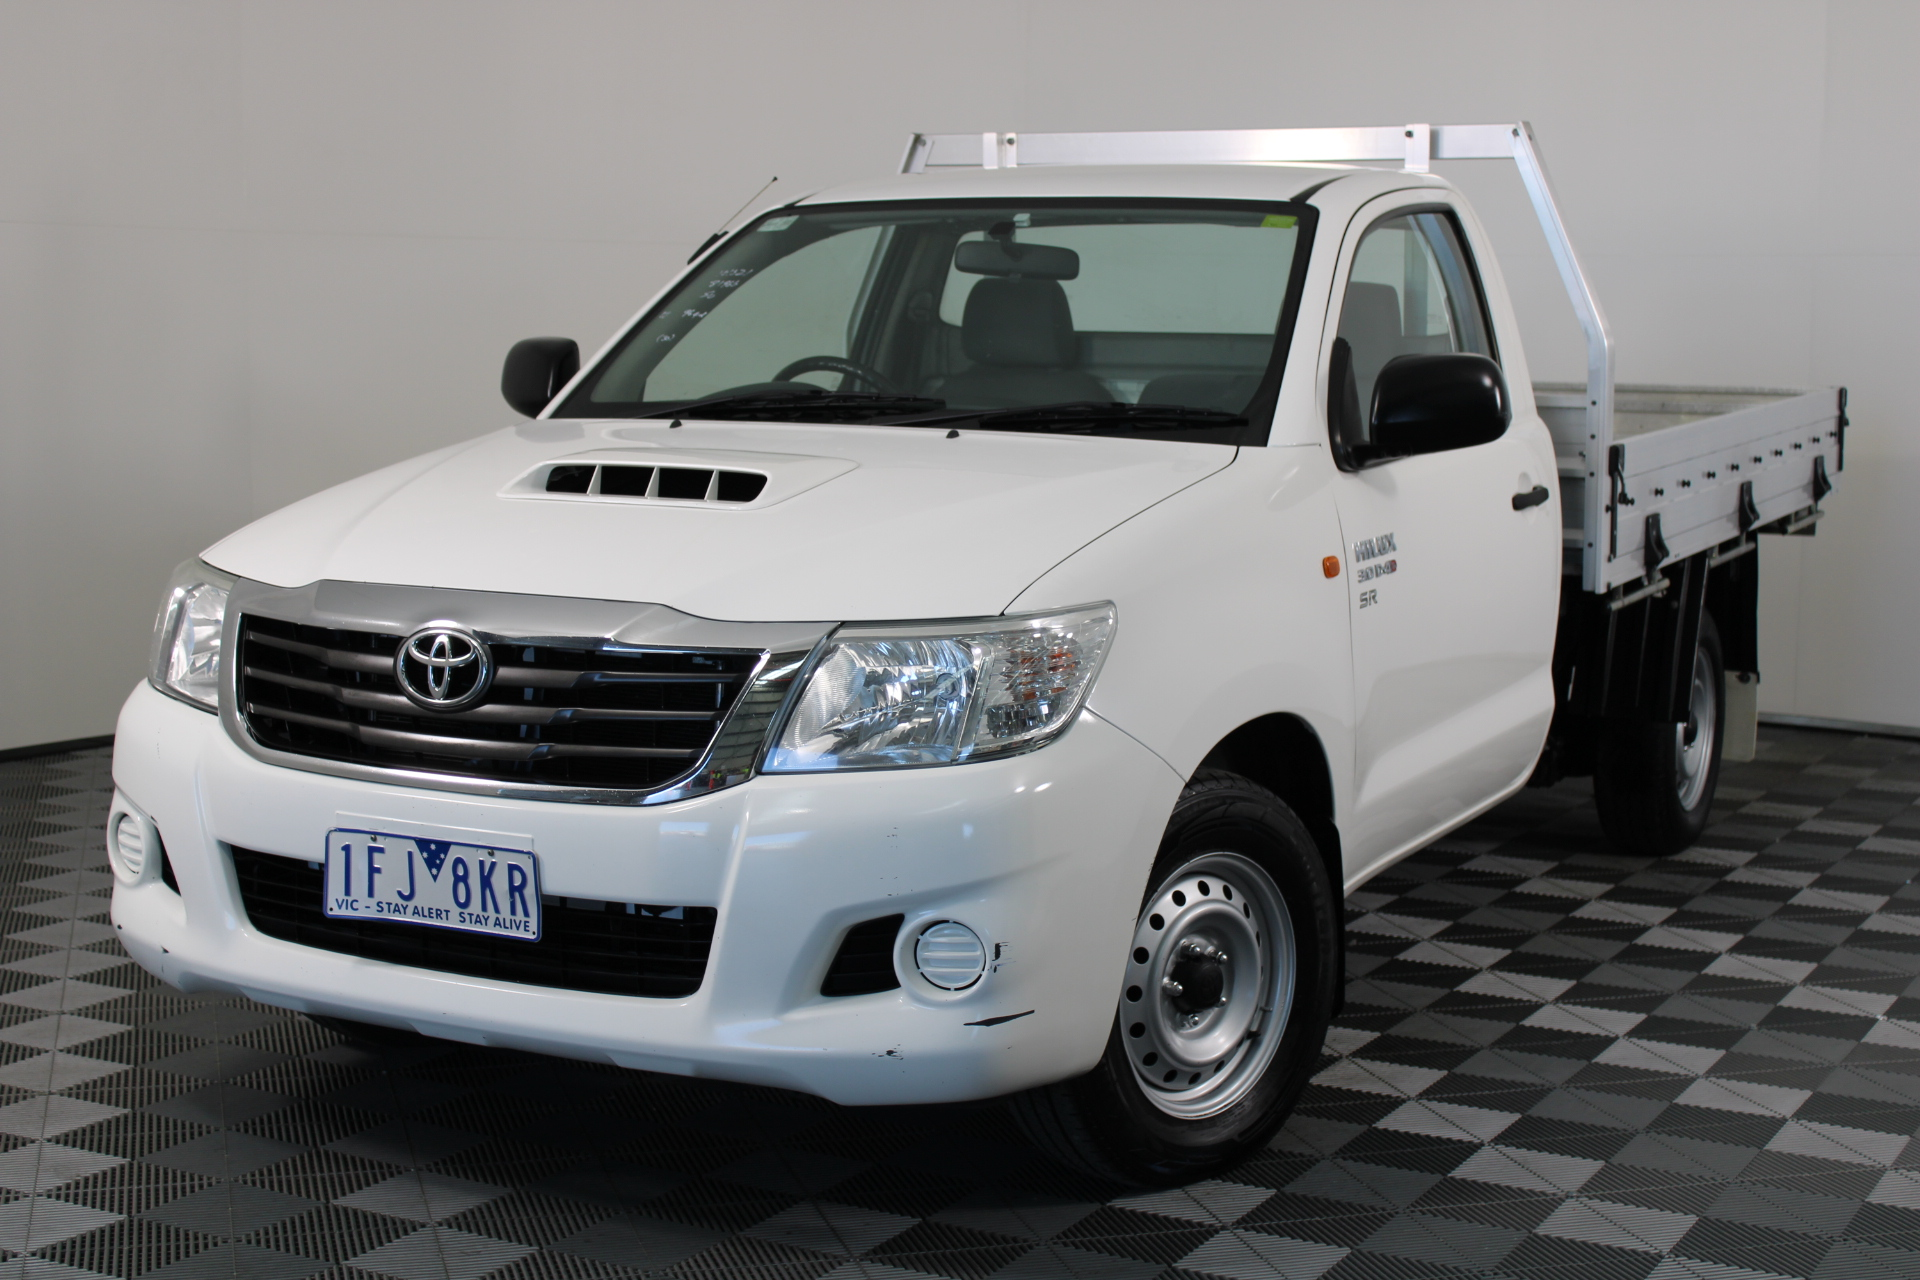 2015 Toyota Hilux SR KUN16R Turbo Diesel Manual Cab Chassis